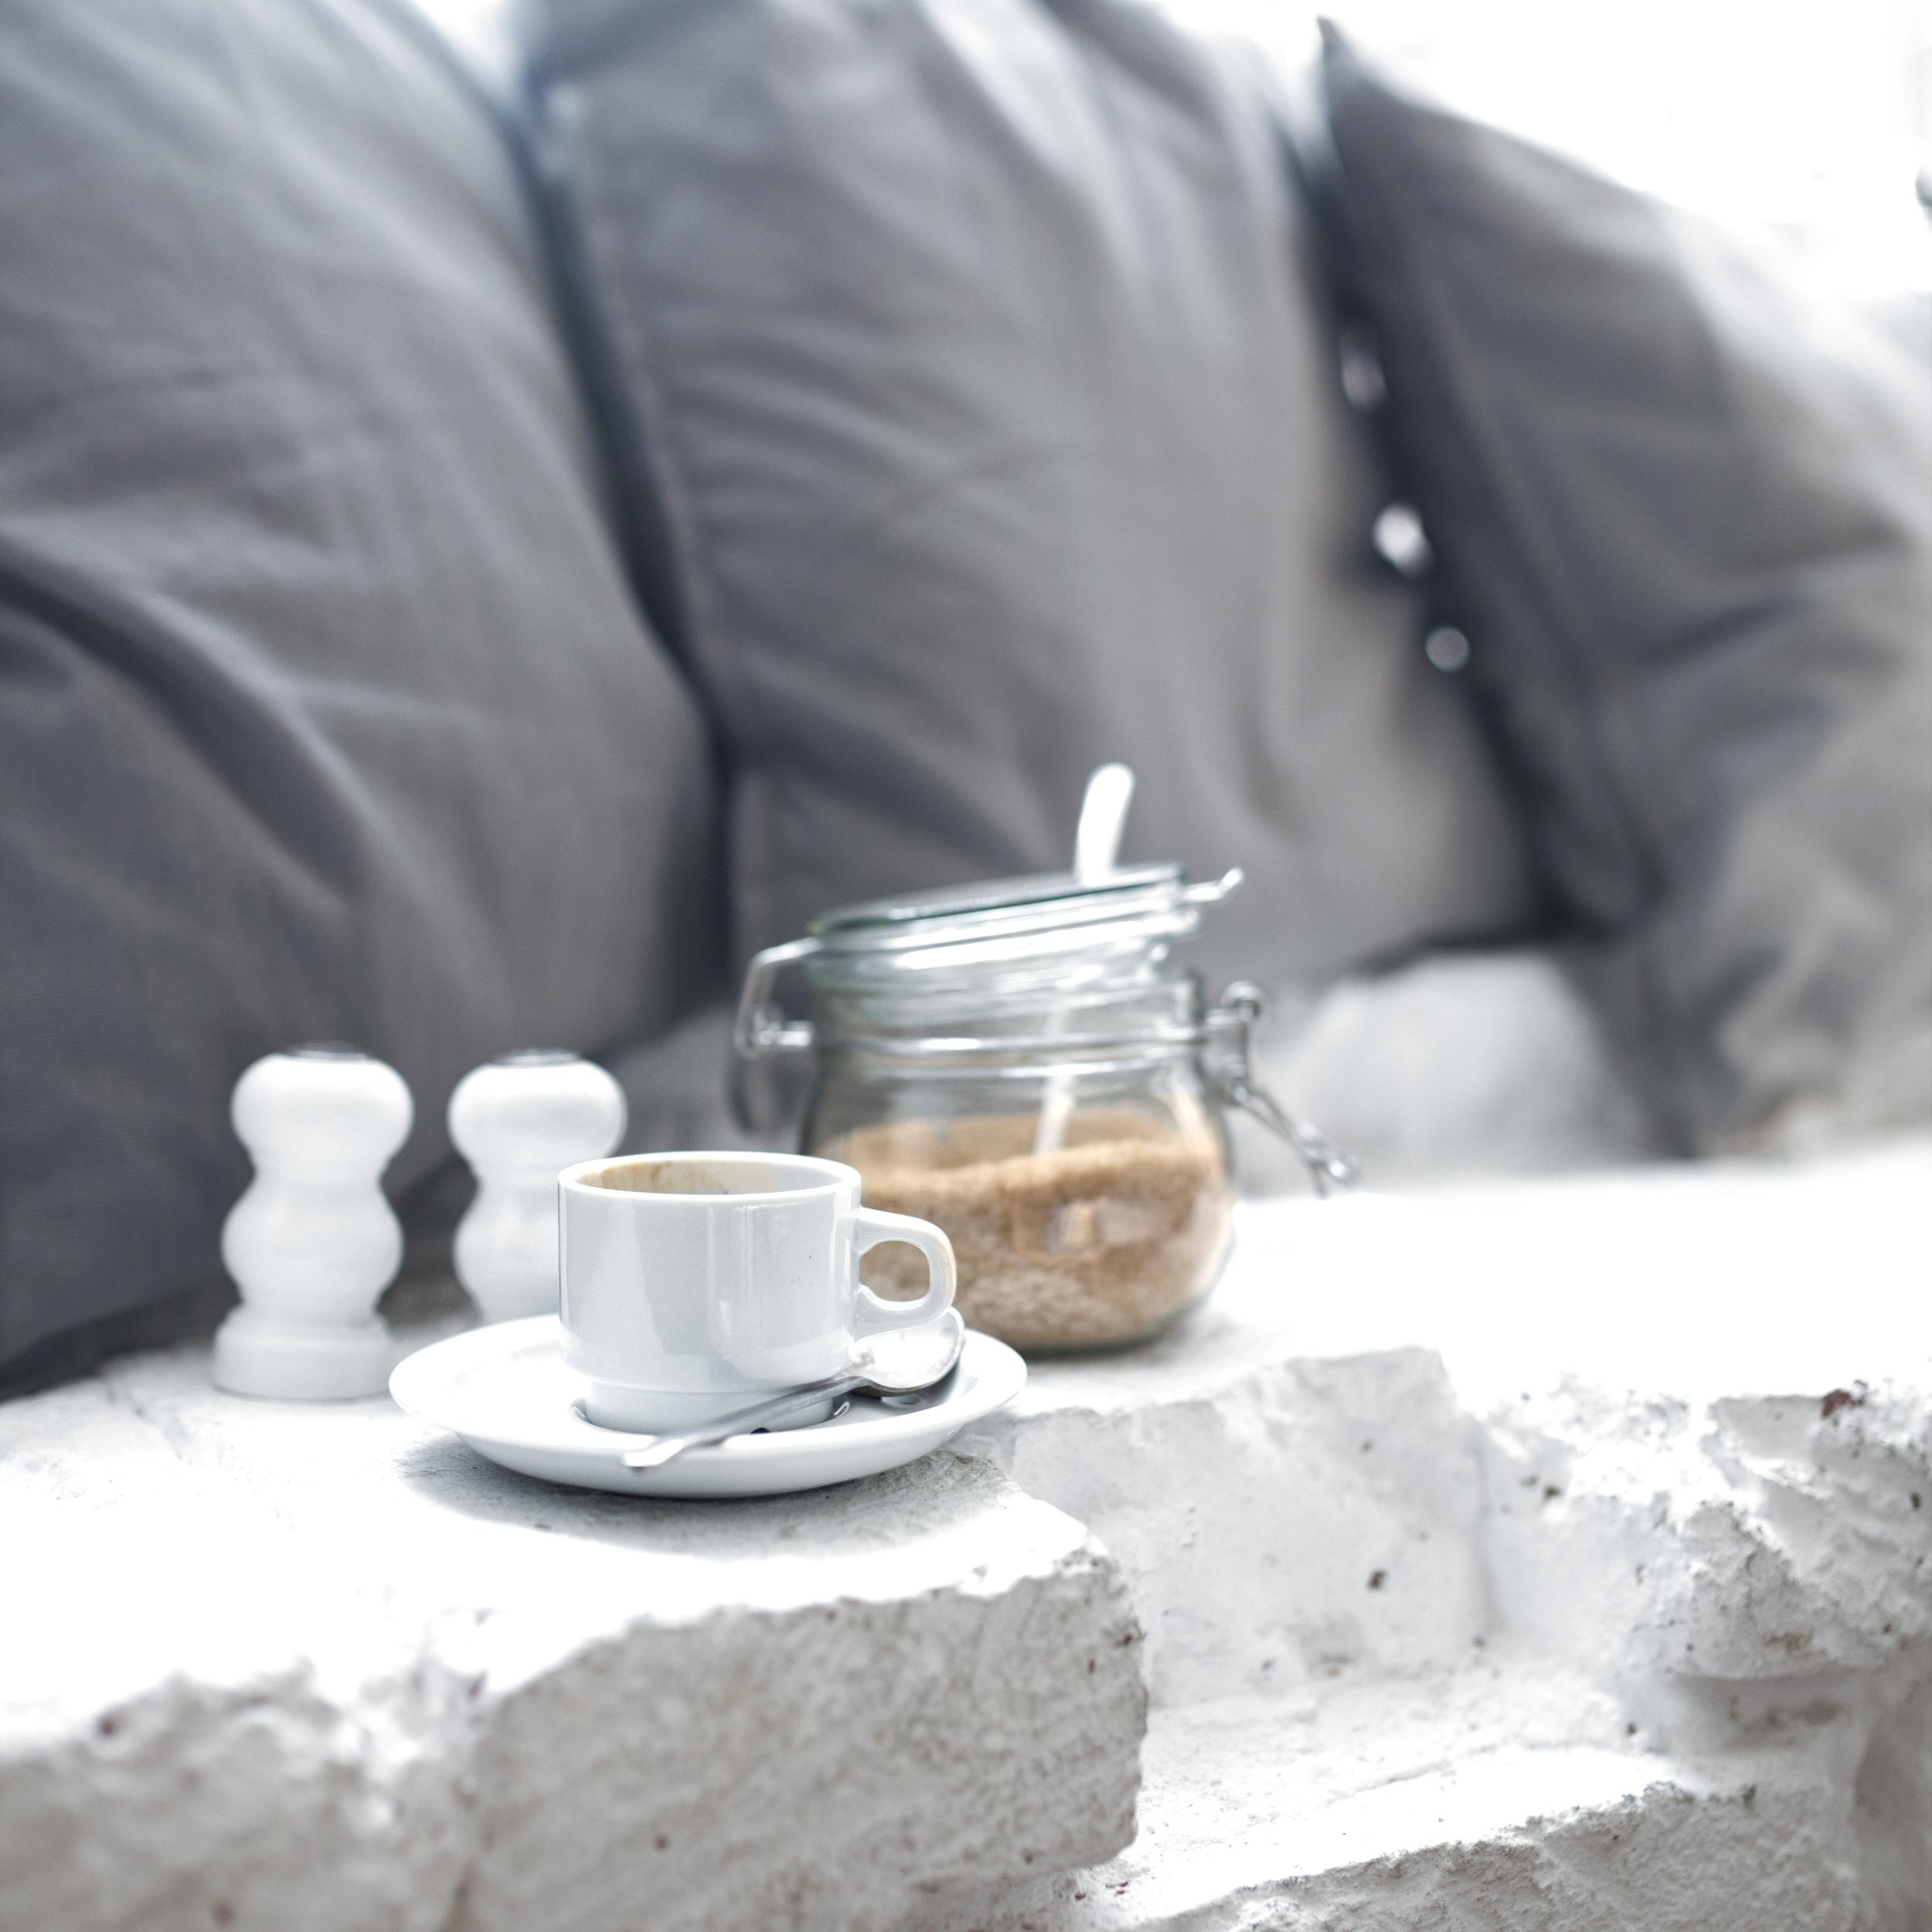 https://static.pexels.com/photos/5686/coffee-morning-sugar-design.jpg